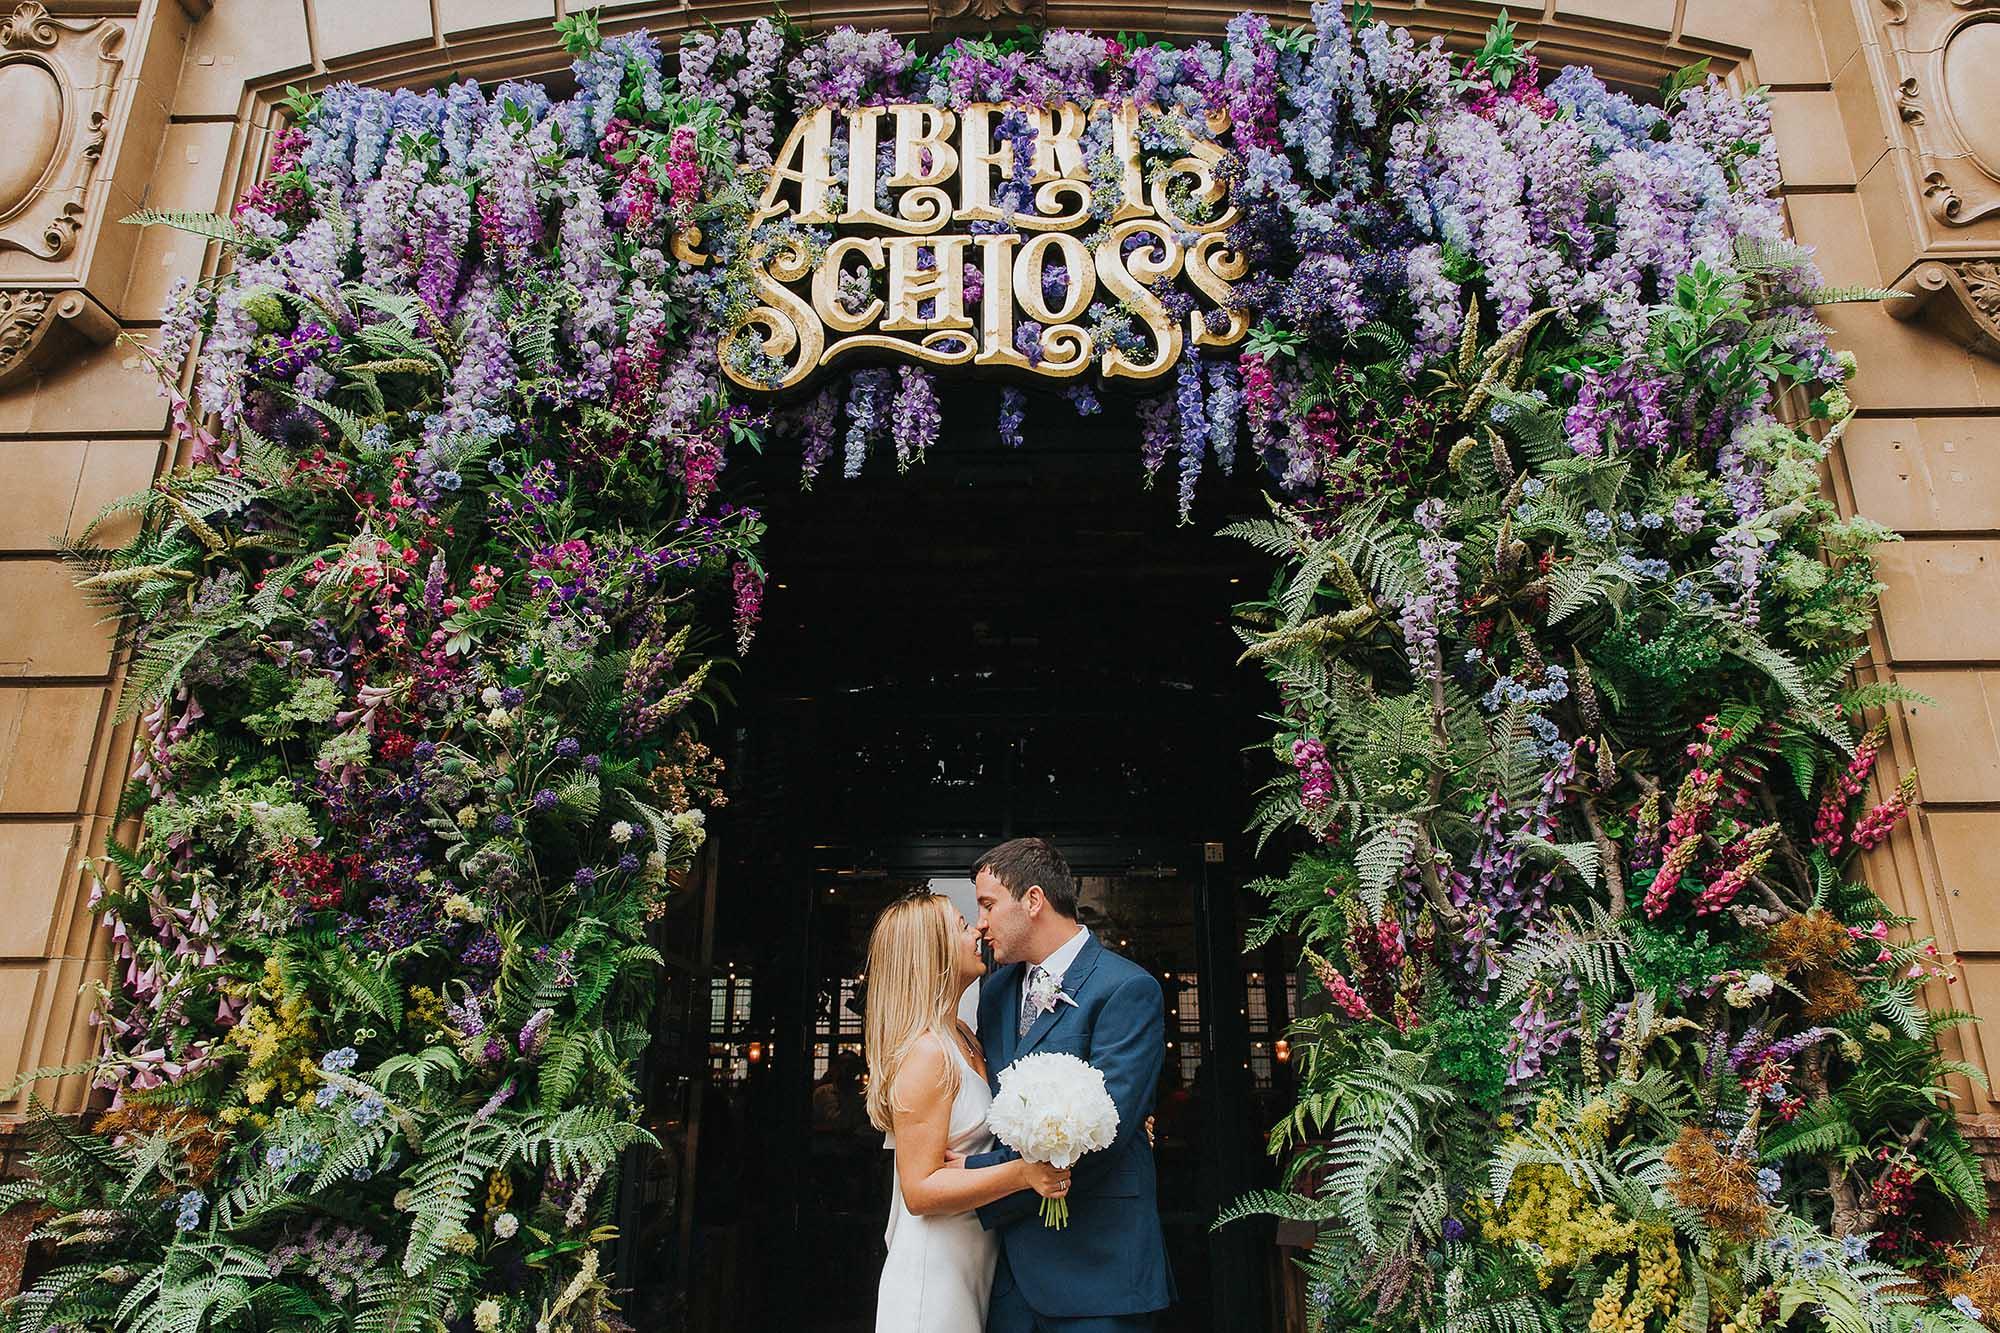 Albert Hall Manchester weddings